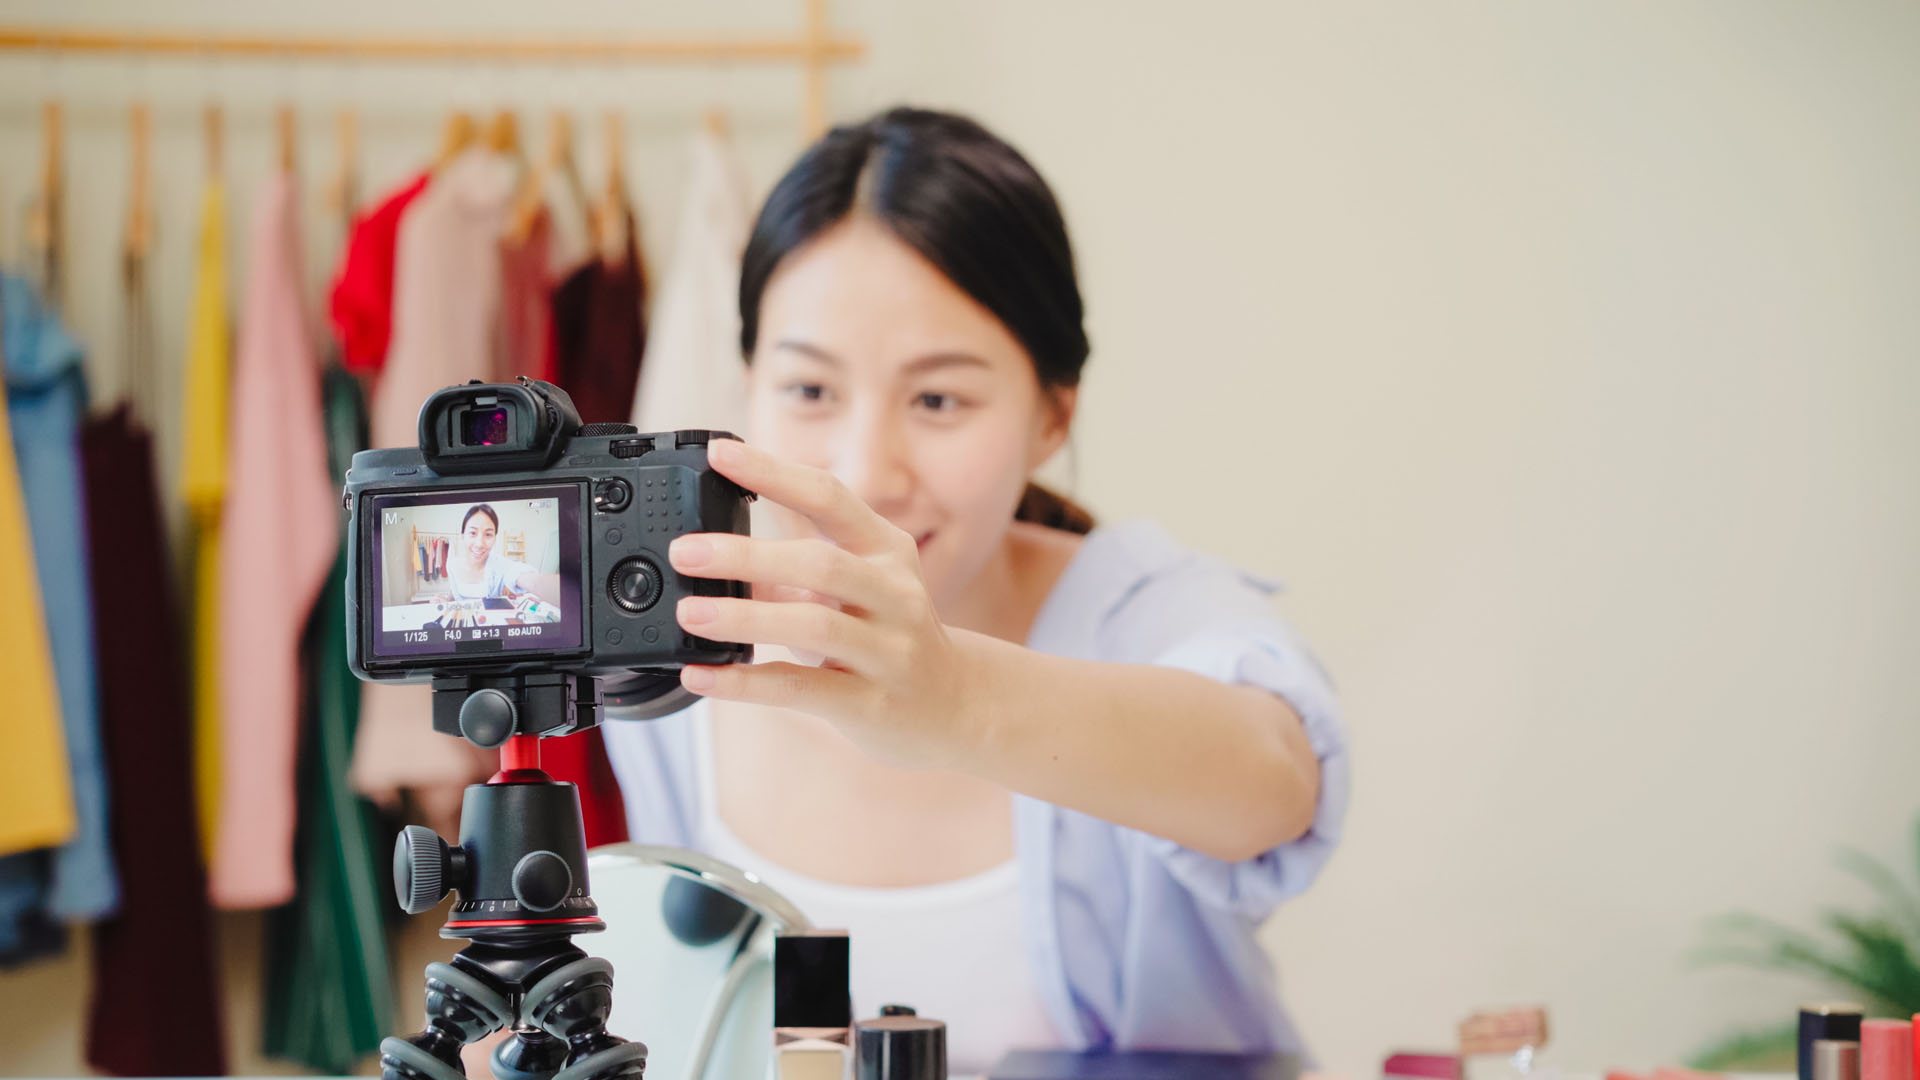 Livestream retail shopping – the future of retail